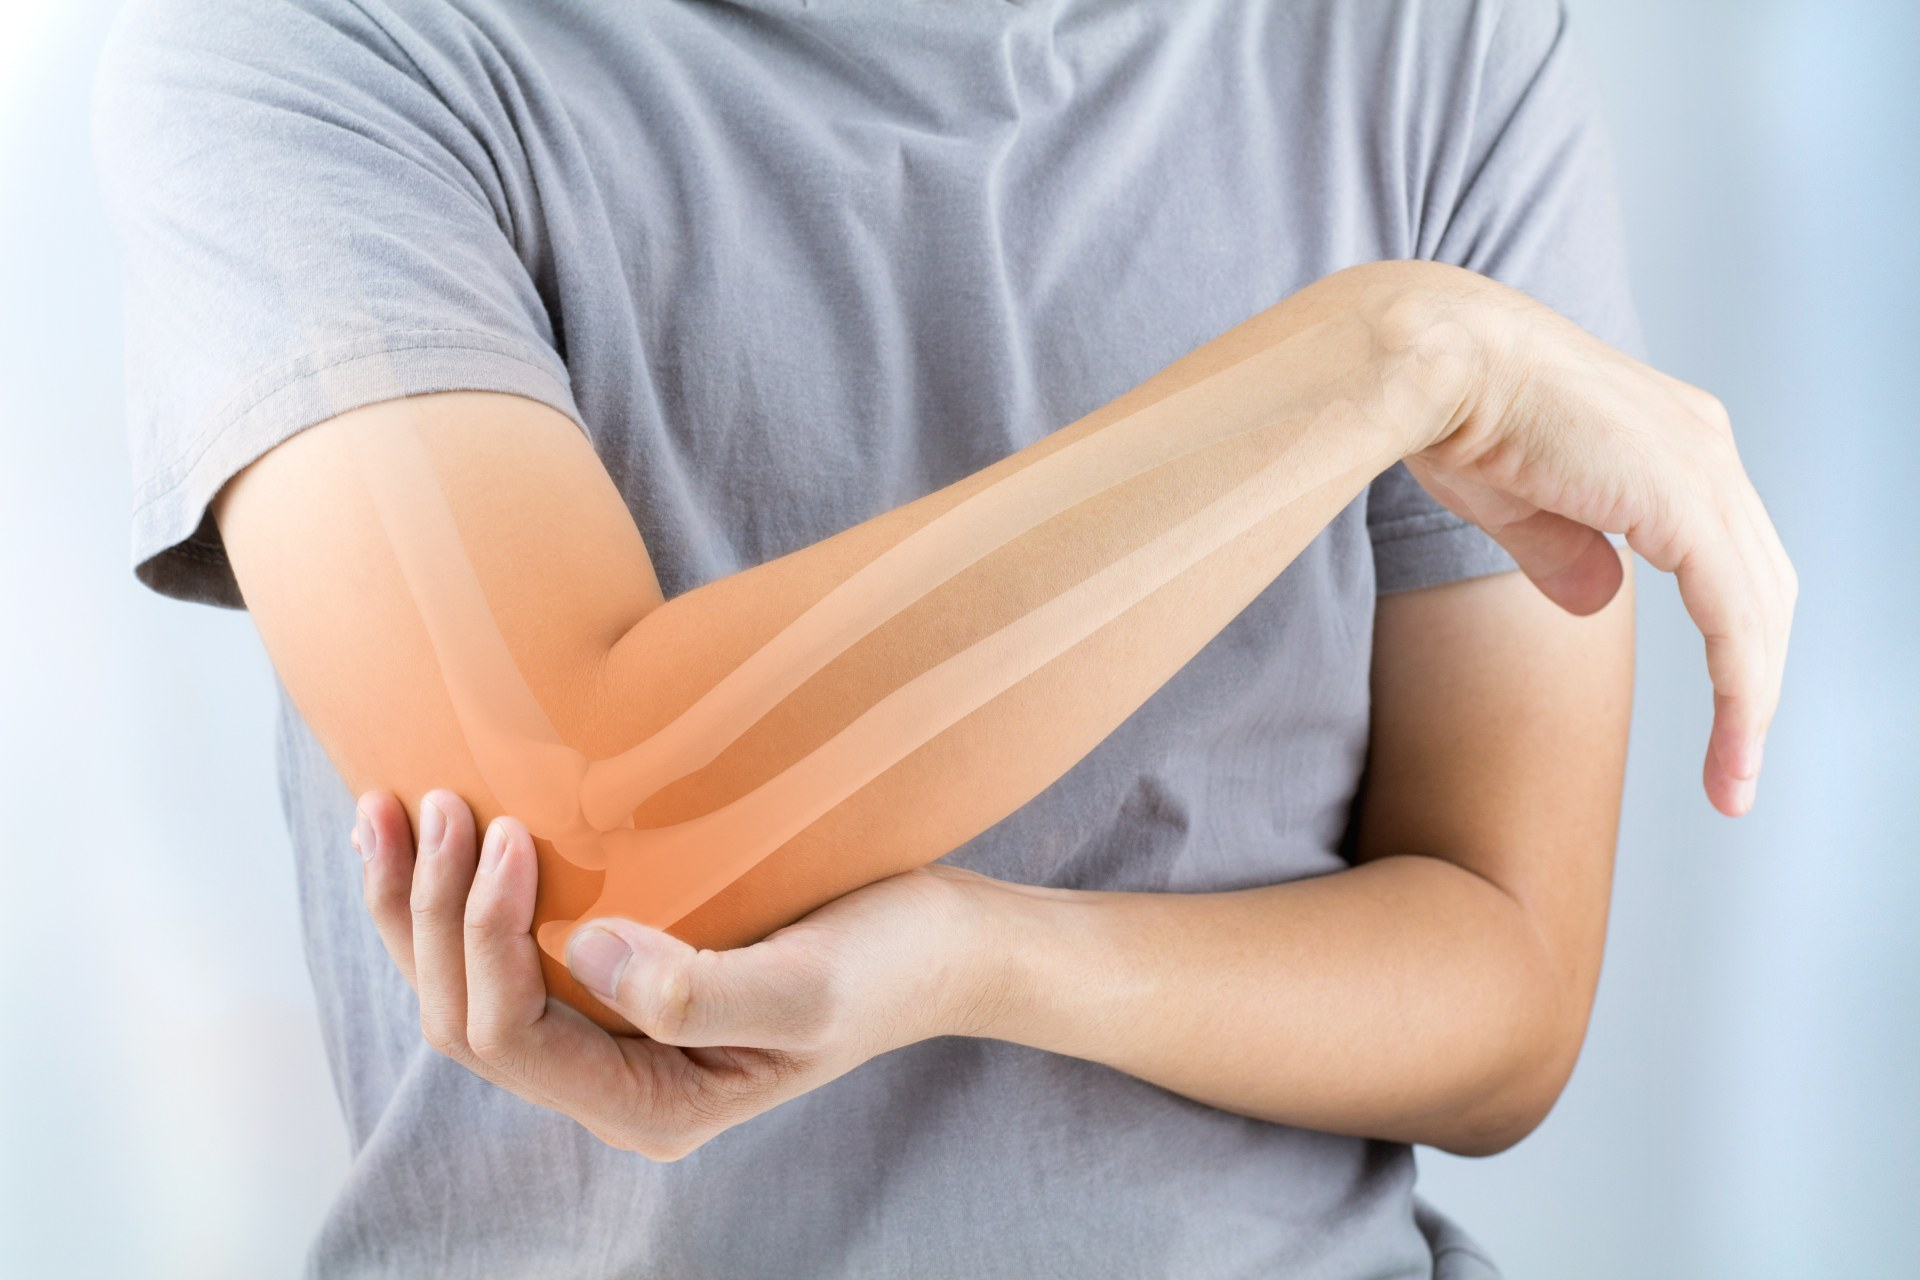 Kosti i zglobovi